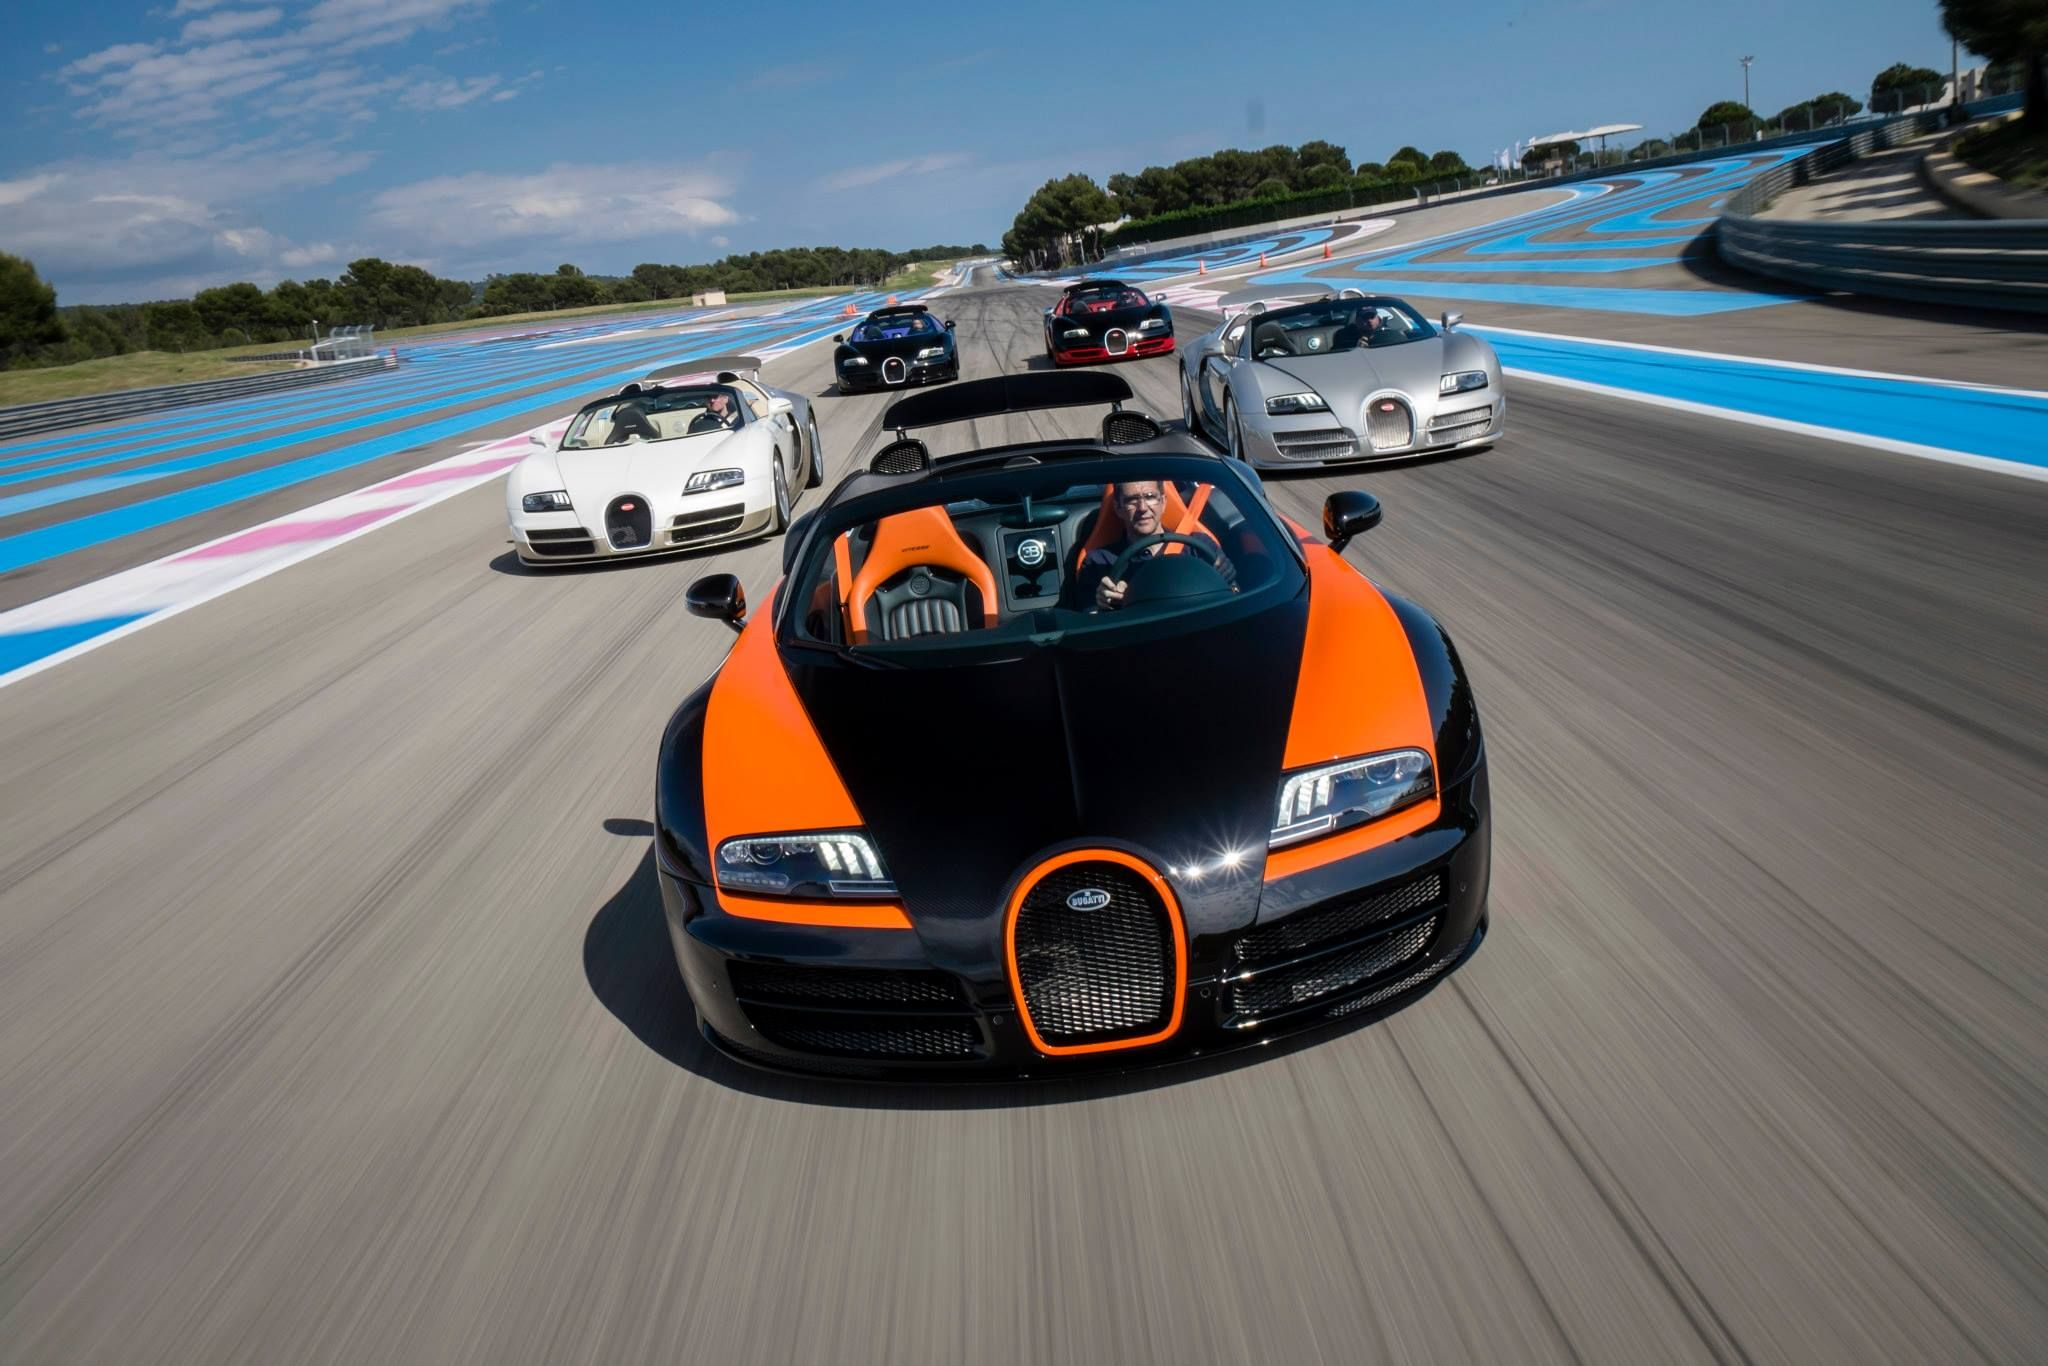 fe37f45612d7d83b649a6c00812ed6ba Interesting Bugatti Veyron Grand Sport Vitesse Vs Pagani Huayra Cars Trend